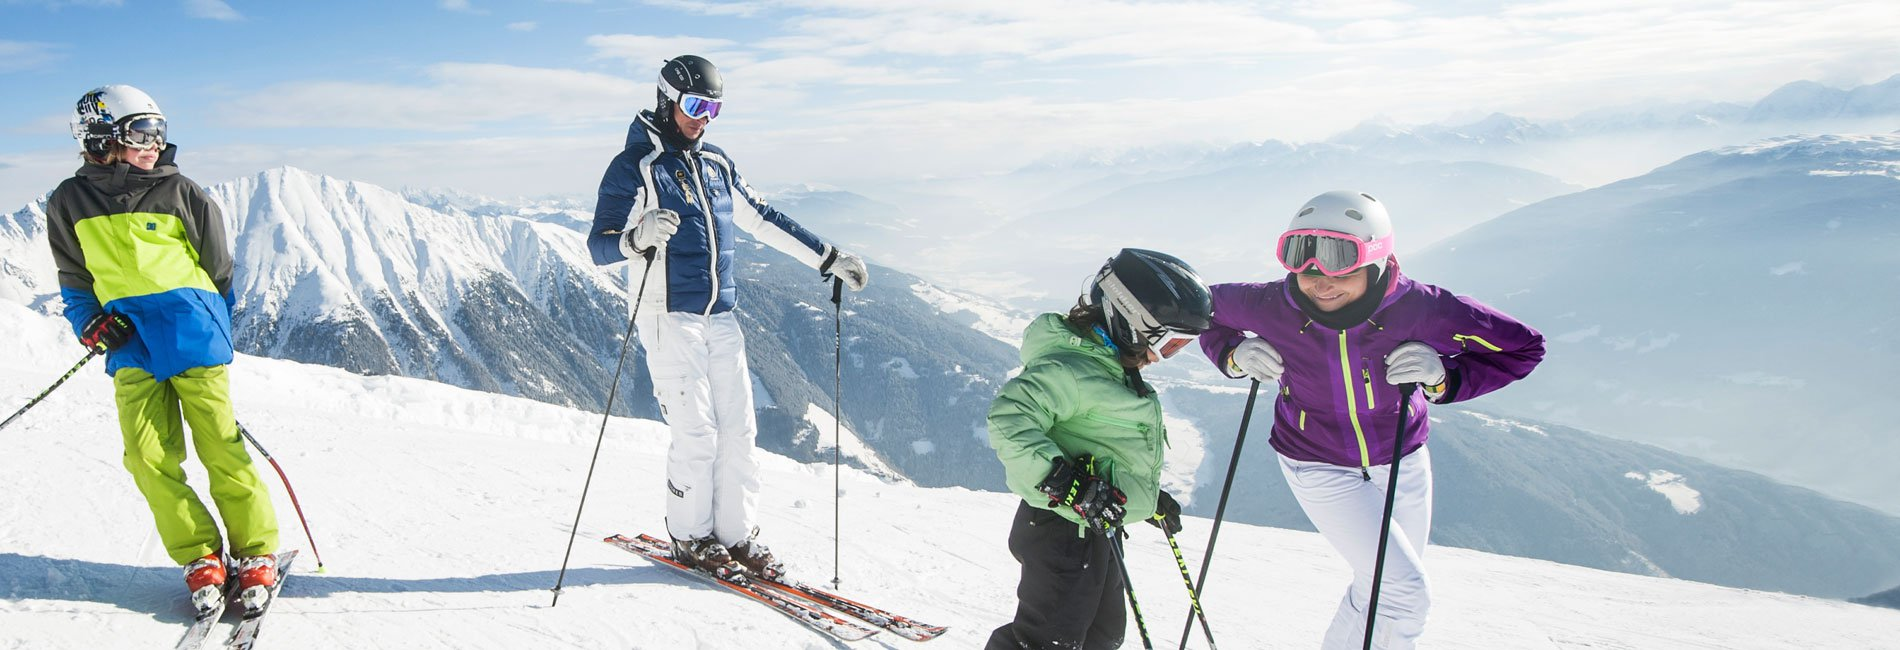 skiurlaub-meransen-29